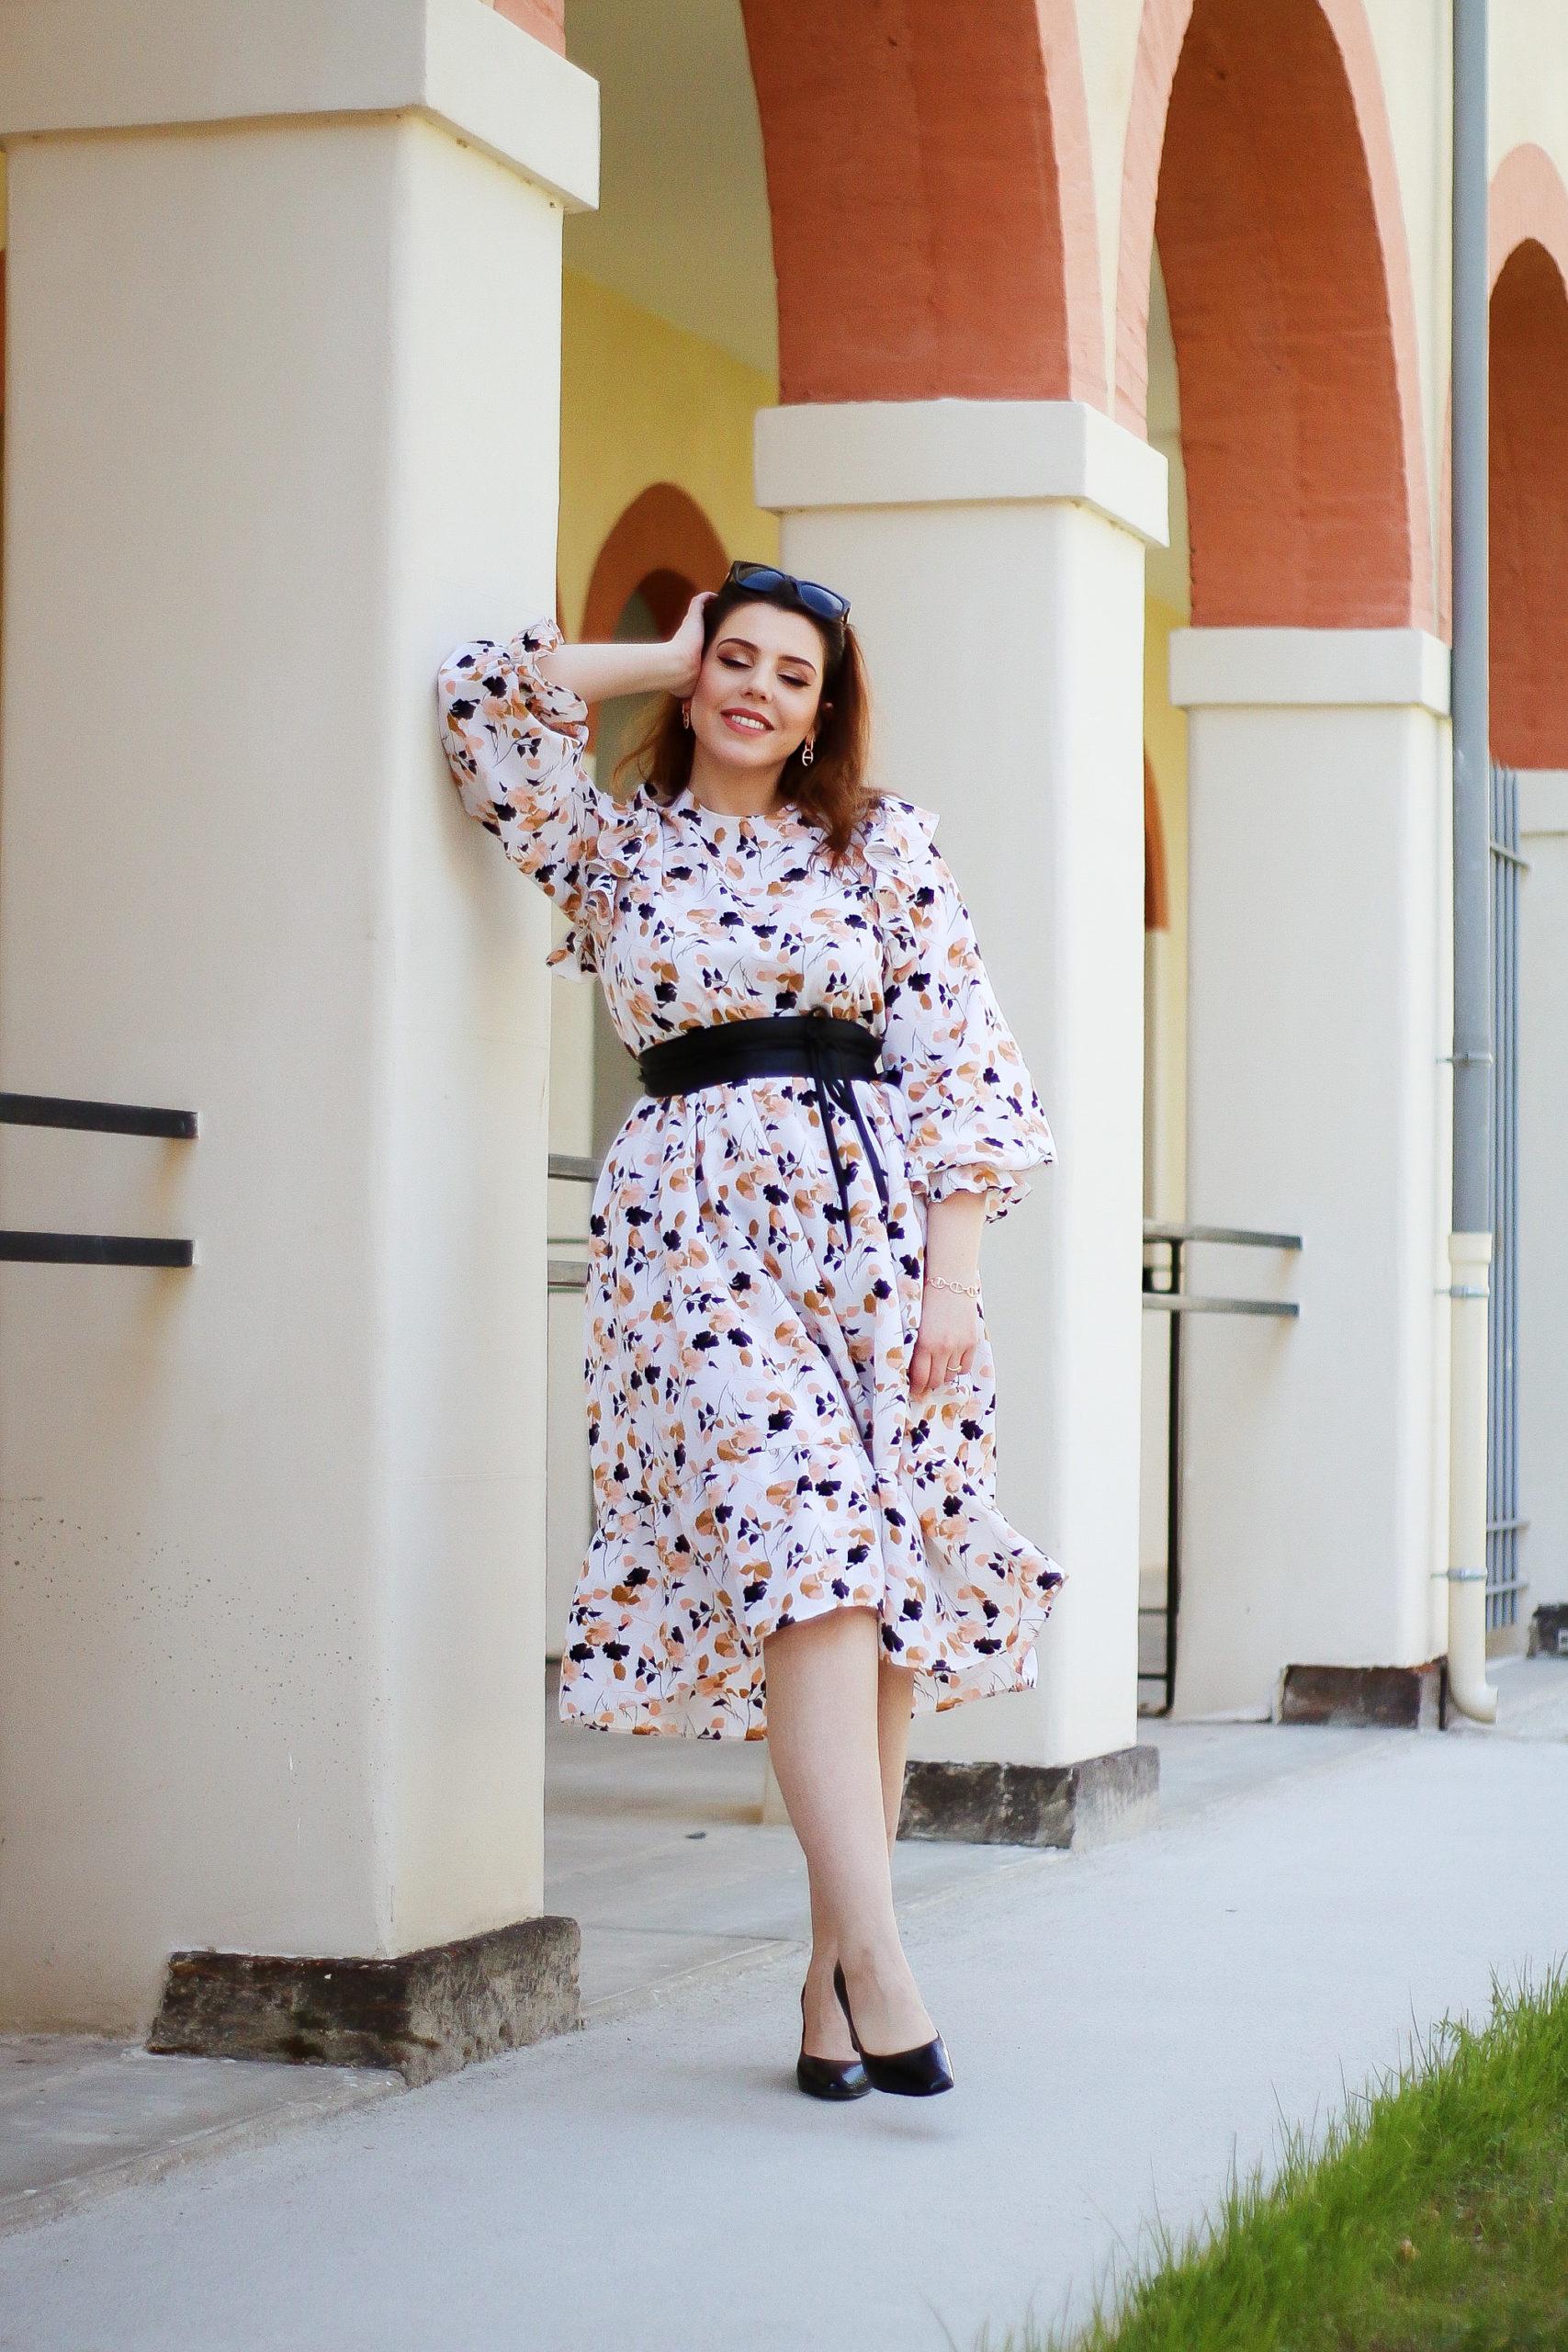 3 tenues de printemps estivale robe de printemps robe rétro vintage robe imprimé fleuri coosy